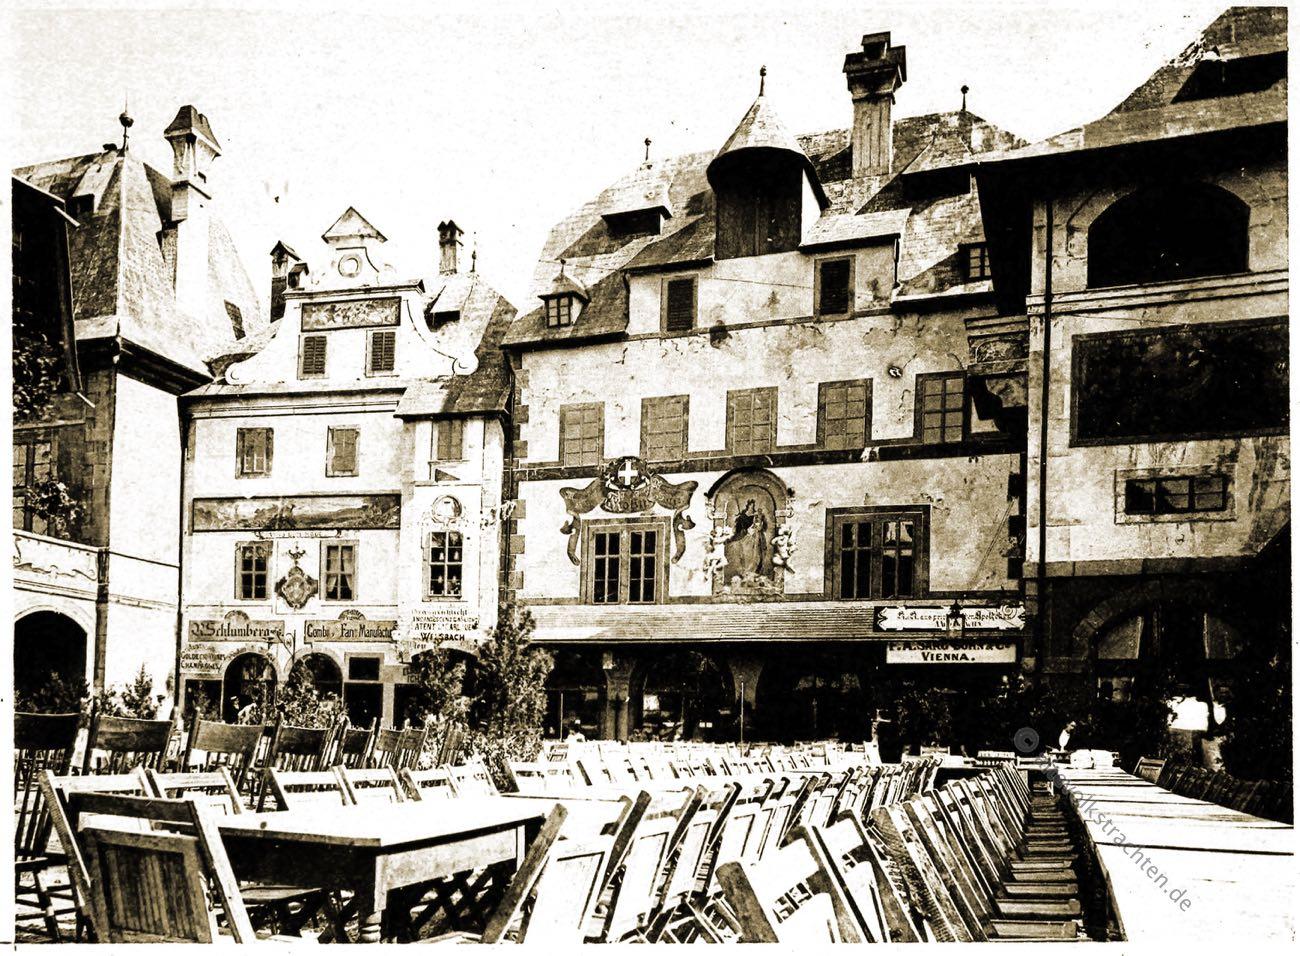 Garten Restauration, Marien Haus, Alt-Wien, Columbian Exposition, Chicago, Adolph Wittemann, Stadtansicht